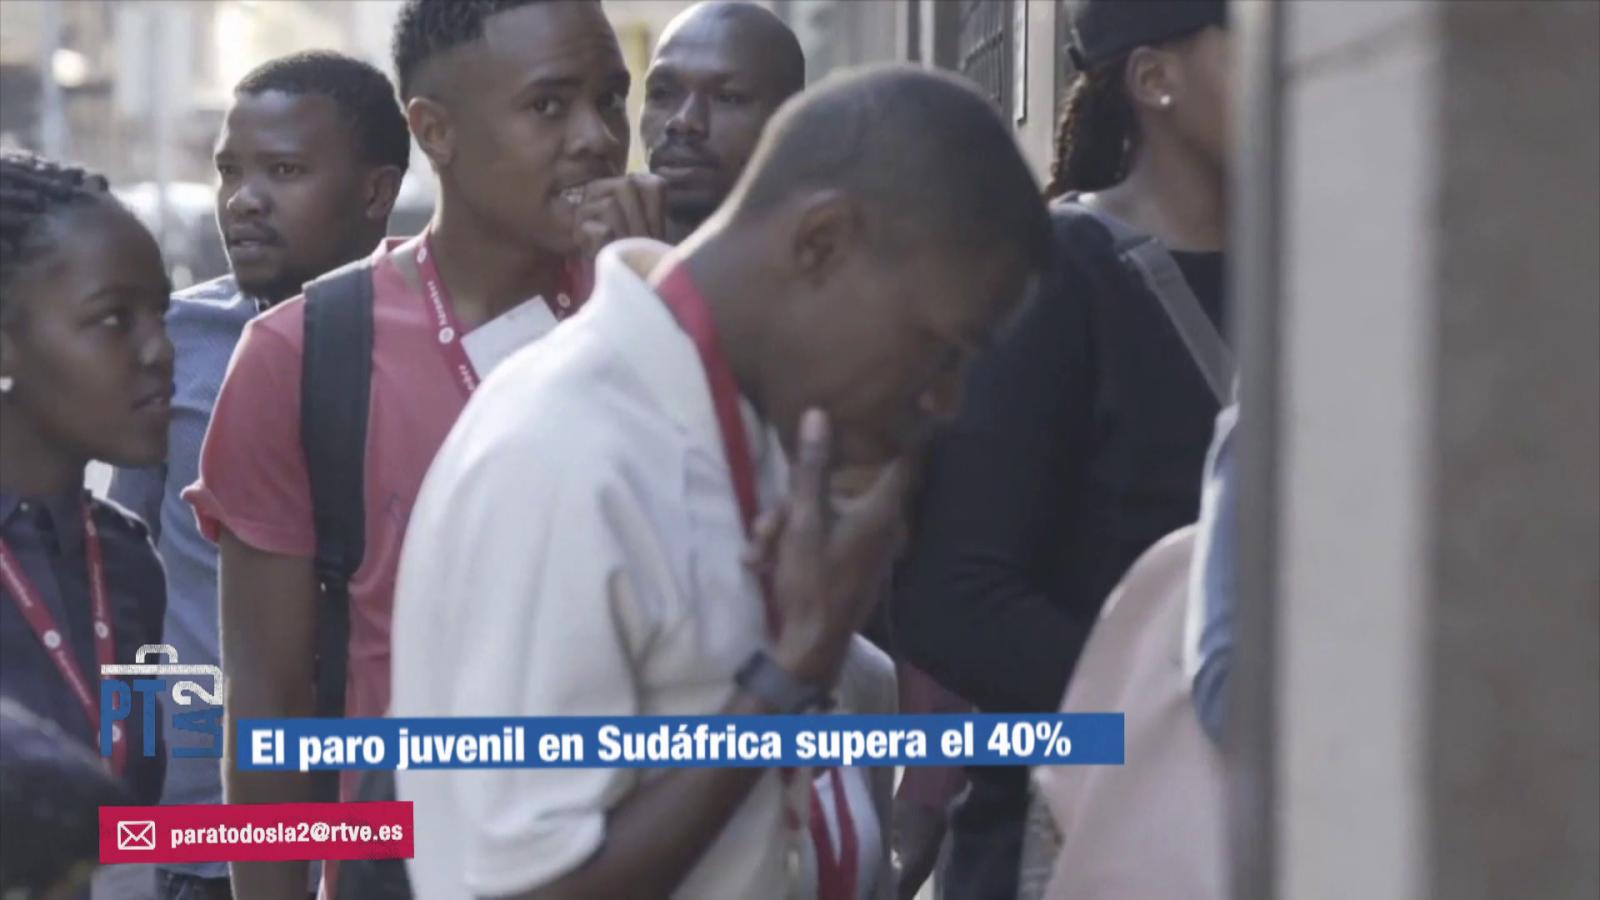 Luchar contra el desempleo juvenil en Sudáfrica